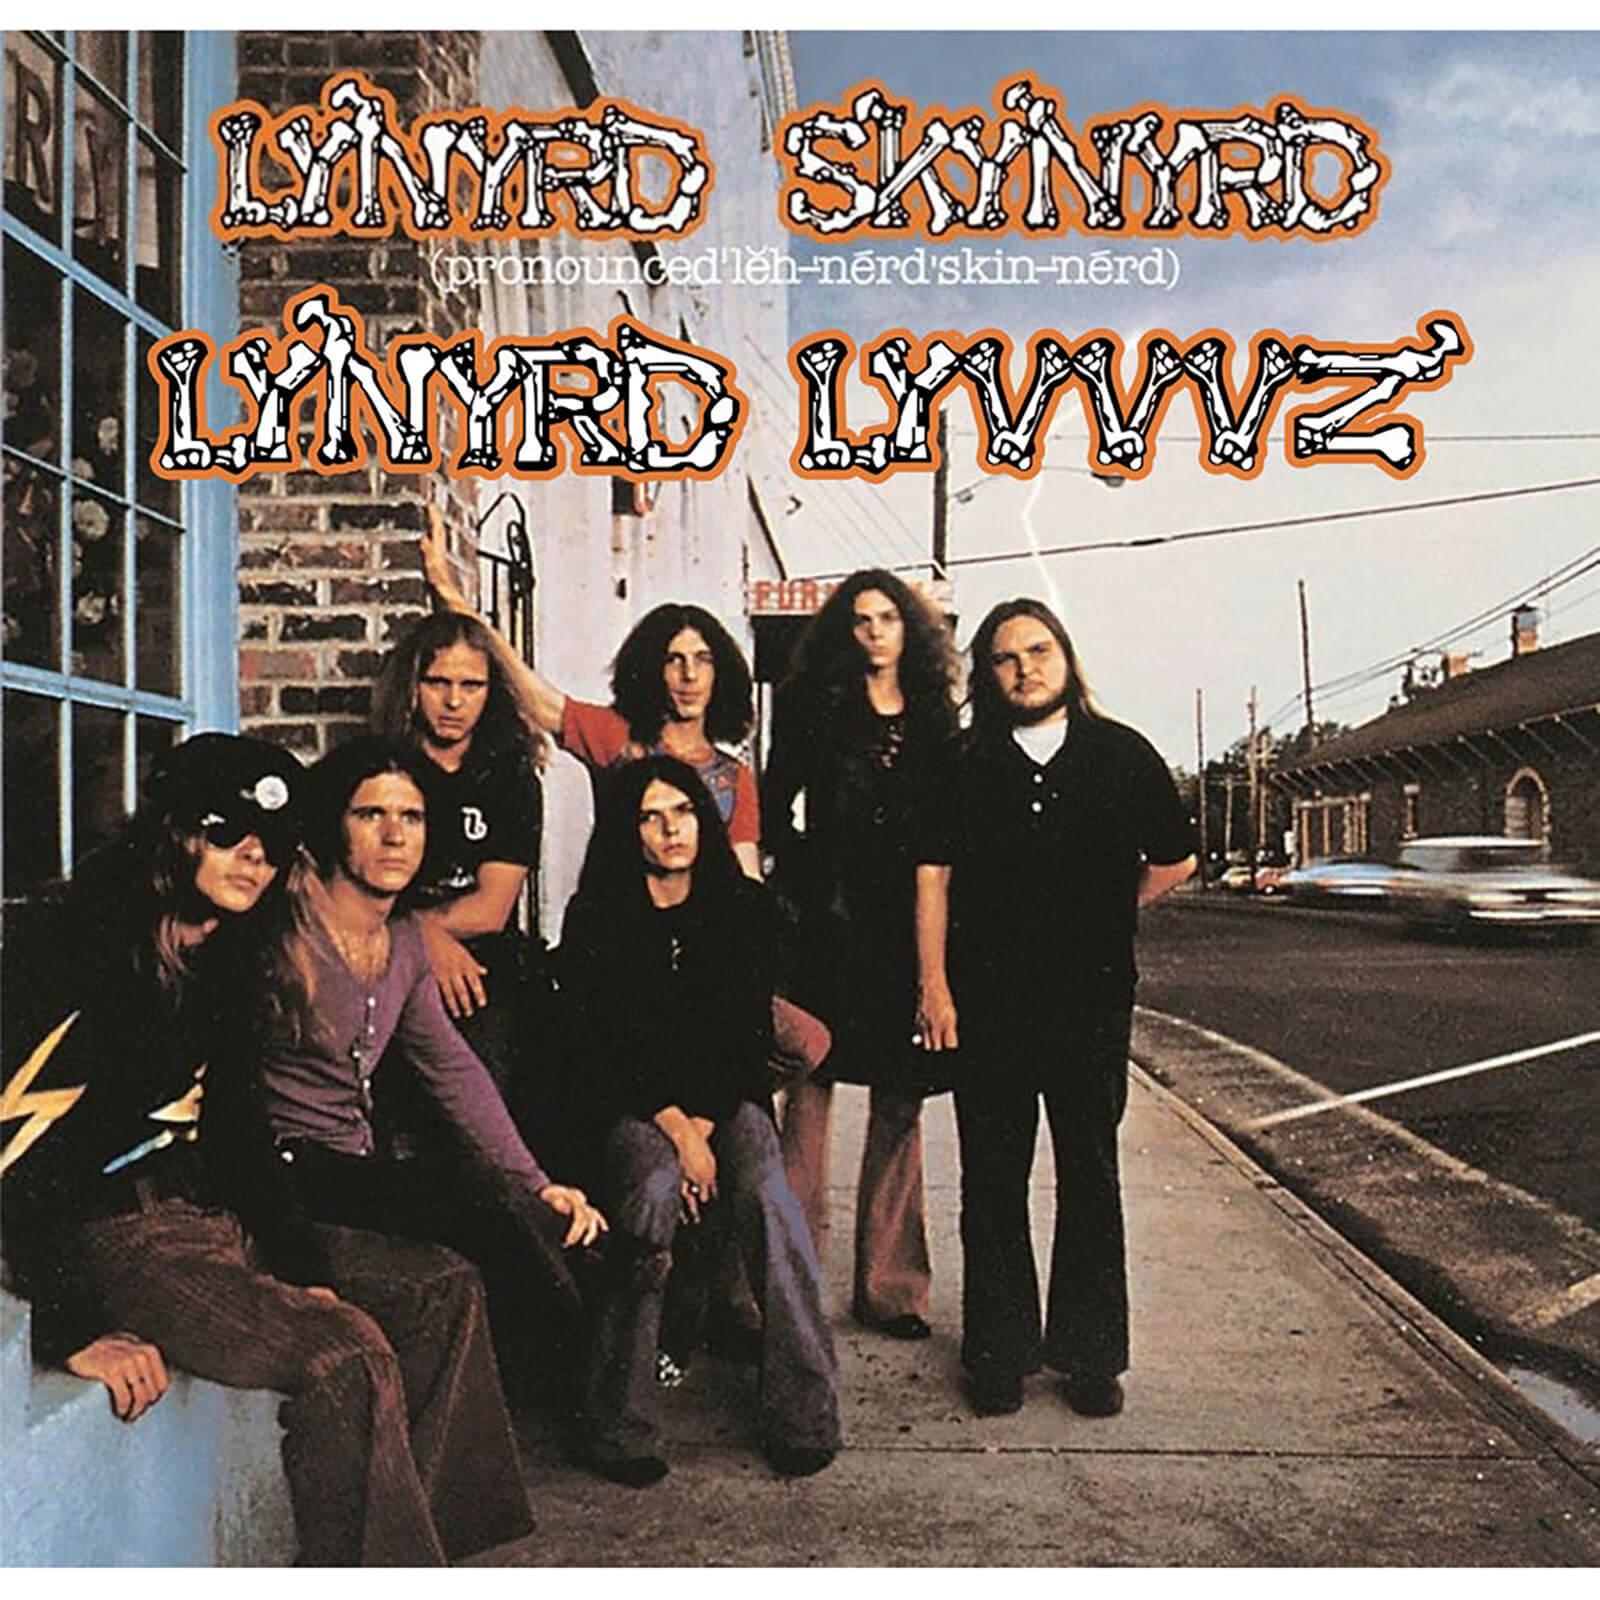 UMC Island Lynyrd Skynyrd - (Pronounced 'Leh-'nerd 'Skin-'nerd) 12 Inch LP